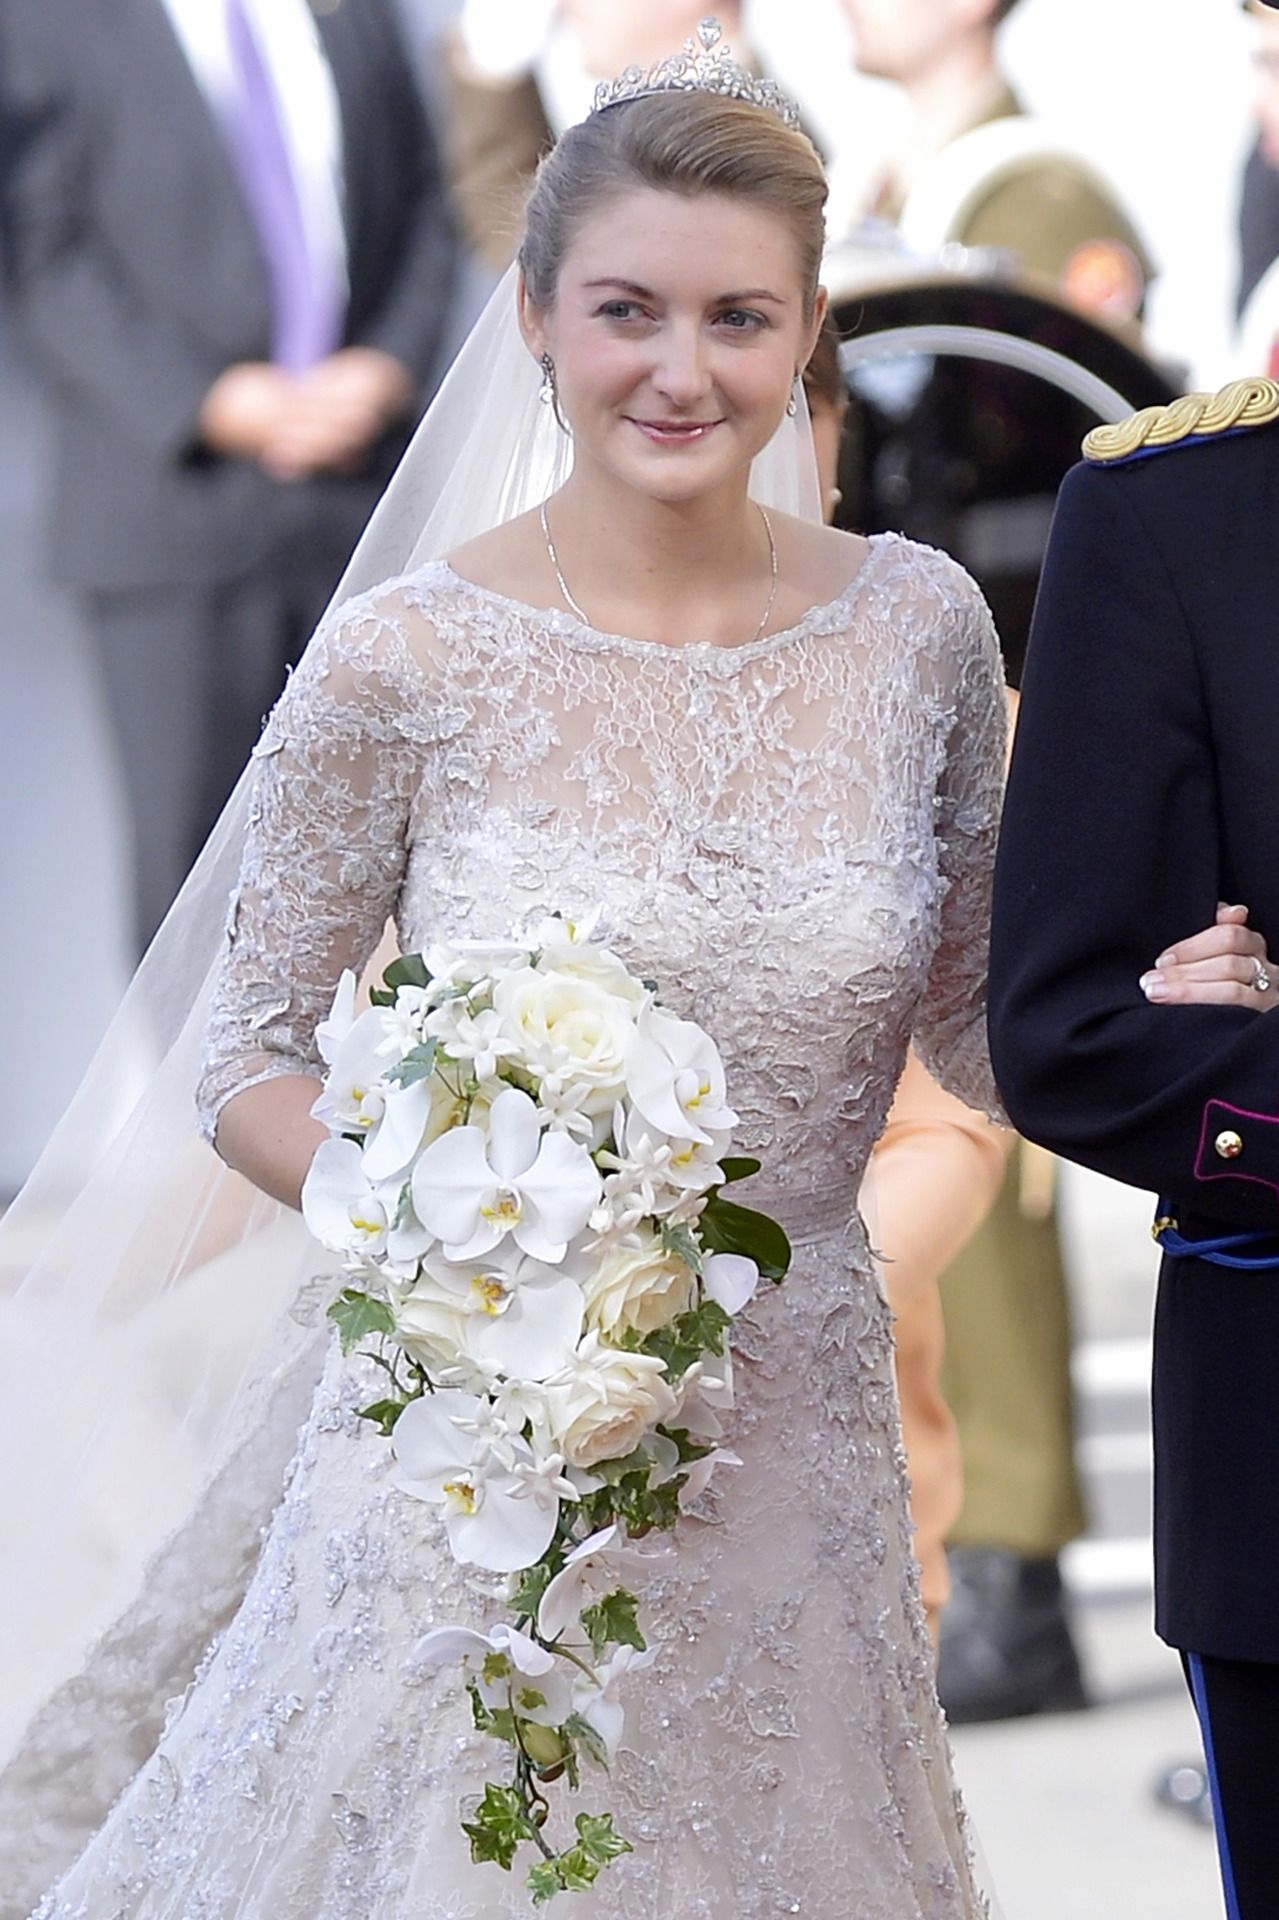 Pin By Sharon Naylor Toris On Royal Wedding Gowns Royal Wedding Gowns Royal Wedding Dress Marriage Dress [ jpg ]